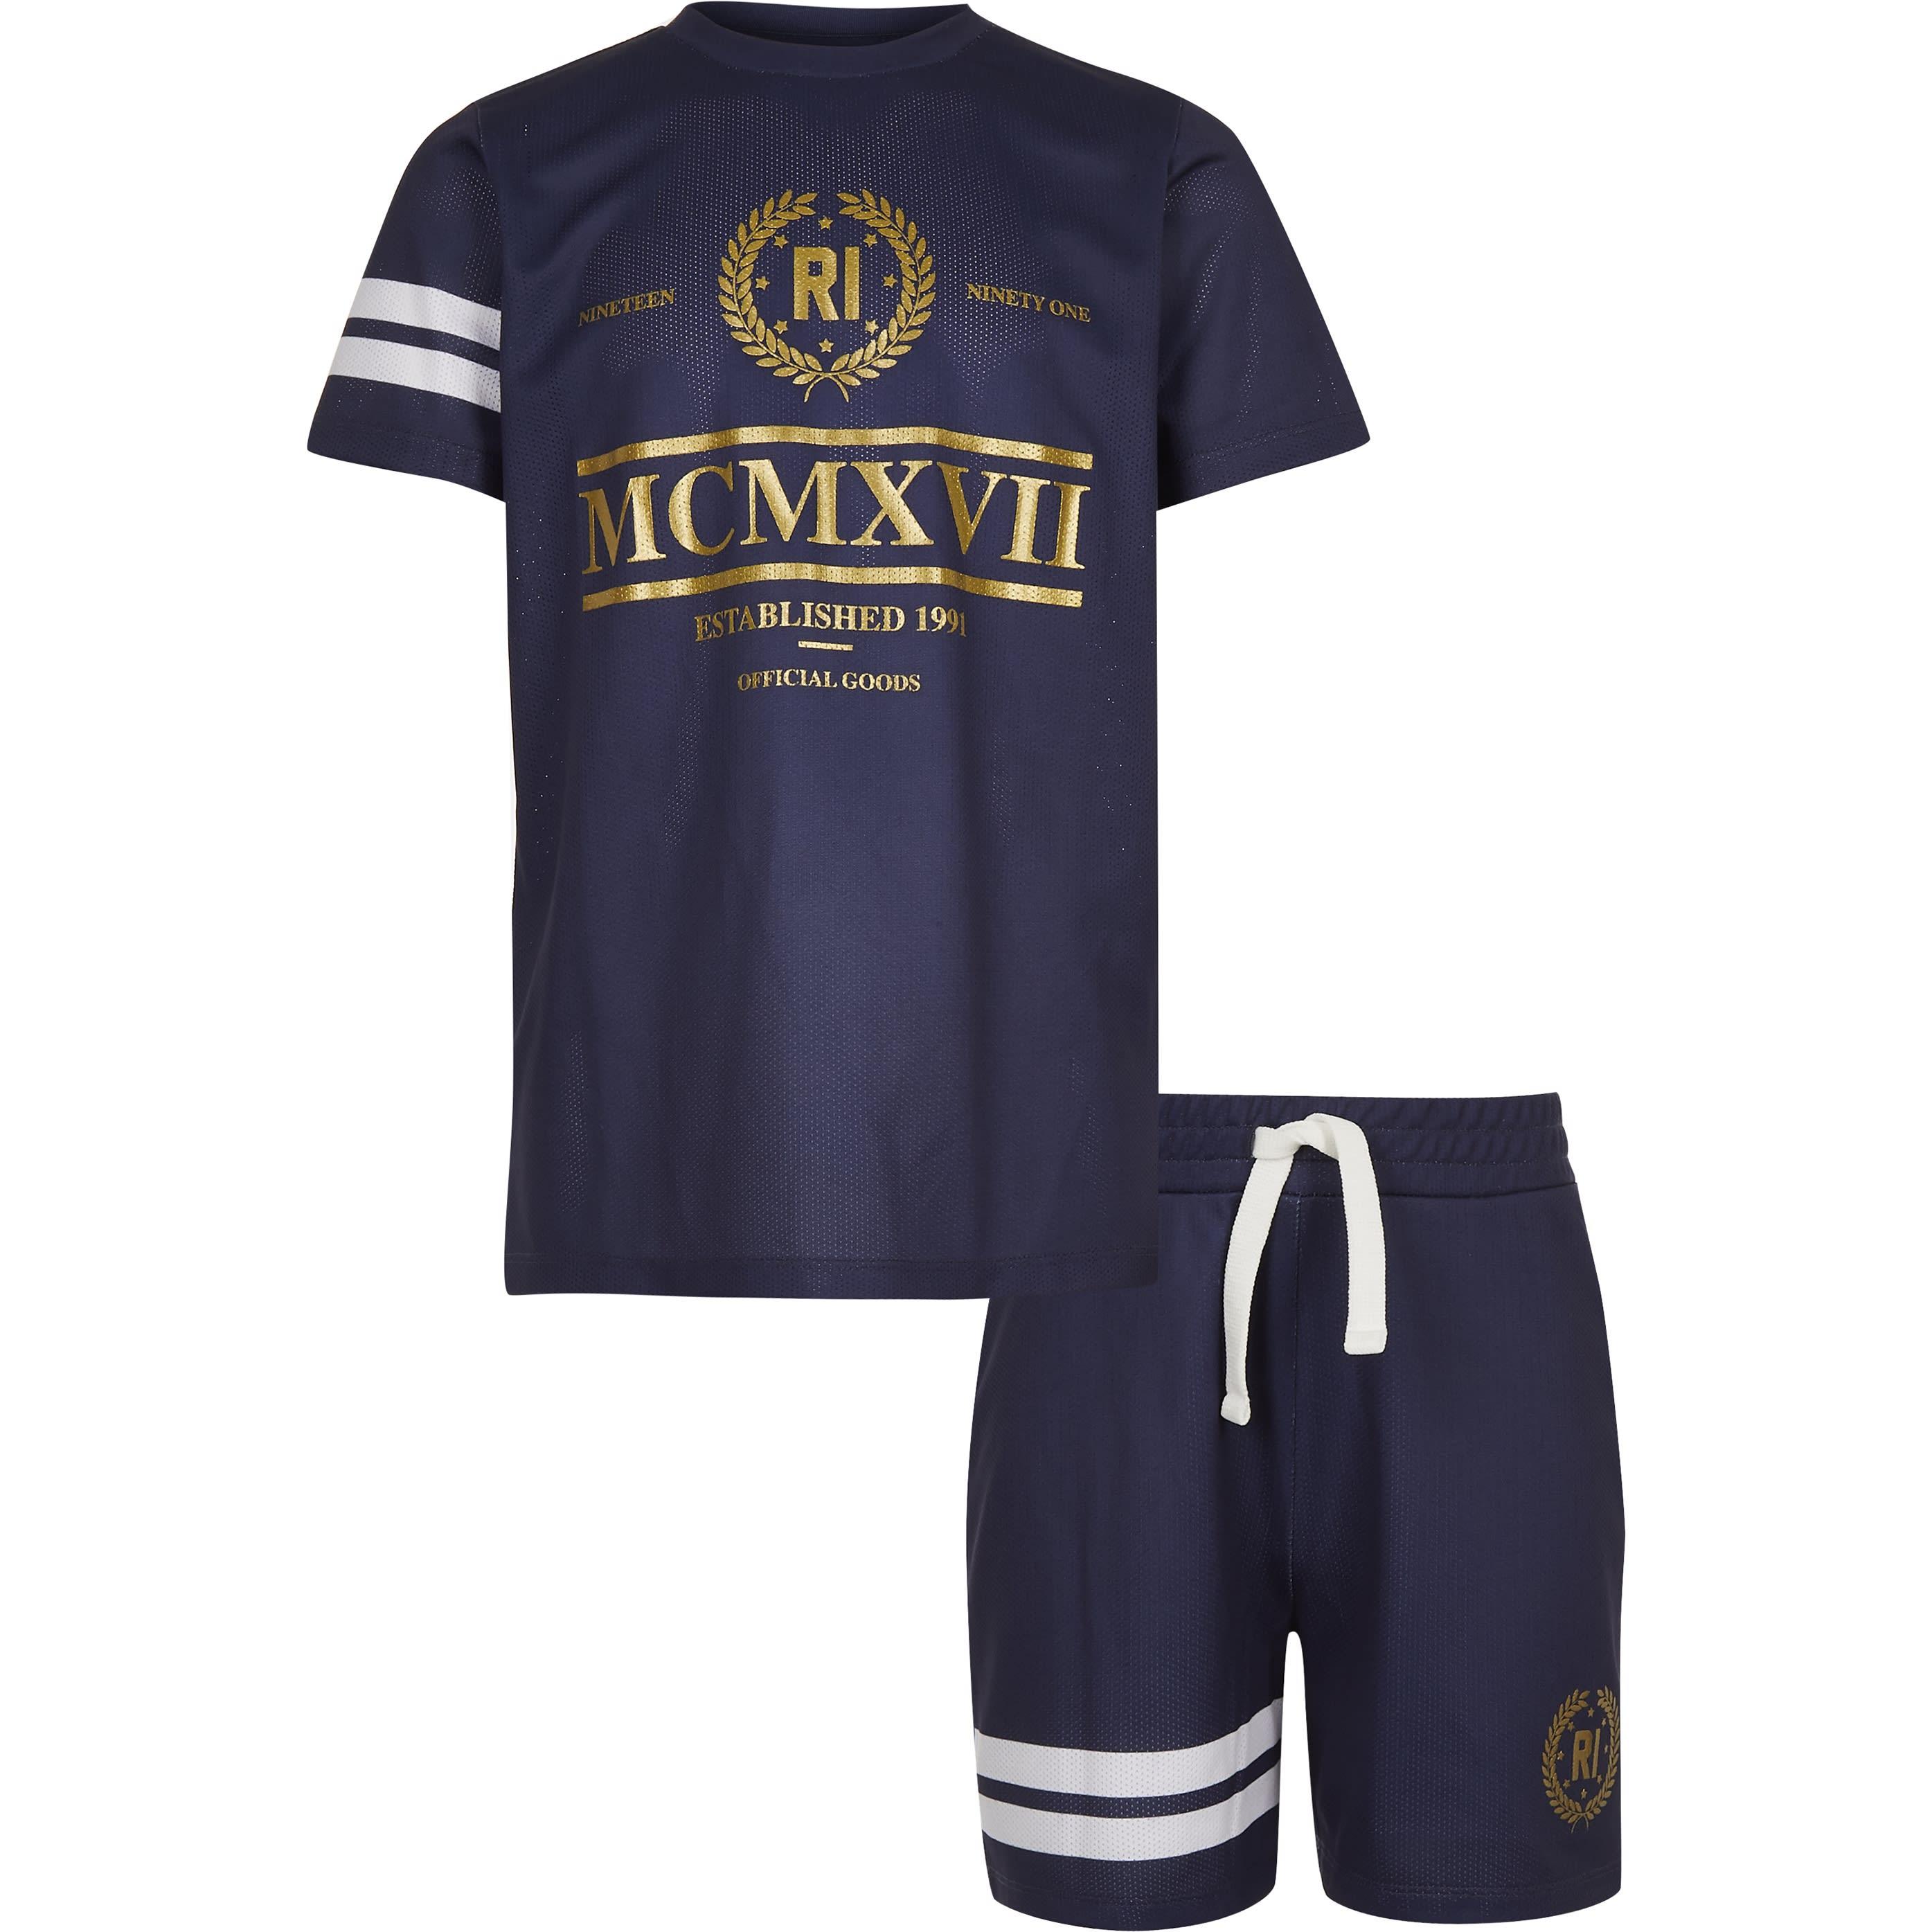 River Island Mens Boys Navy foil print mesh T-shirt outfit (11-12 Yrs)